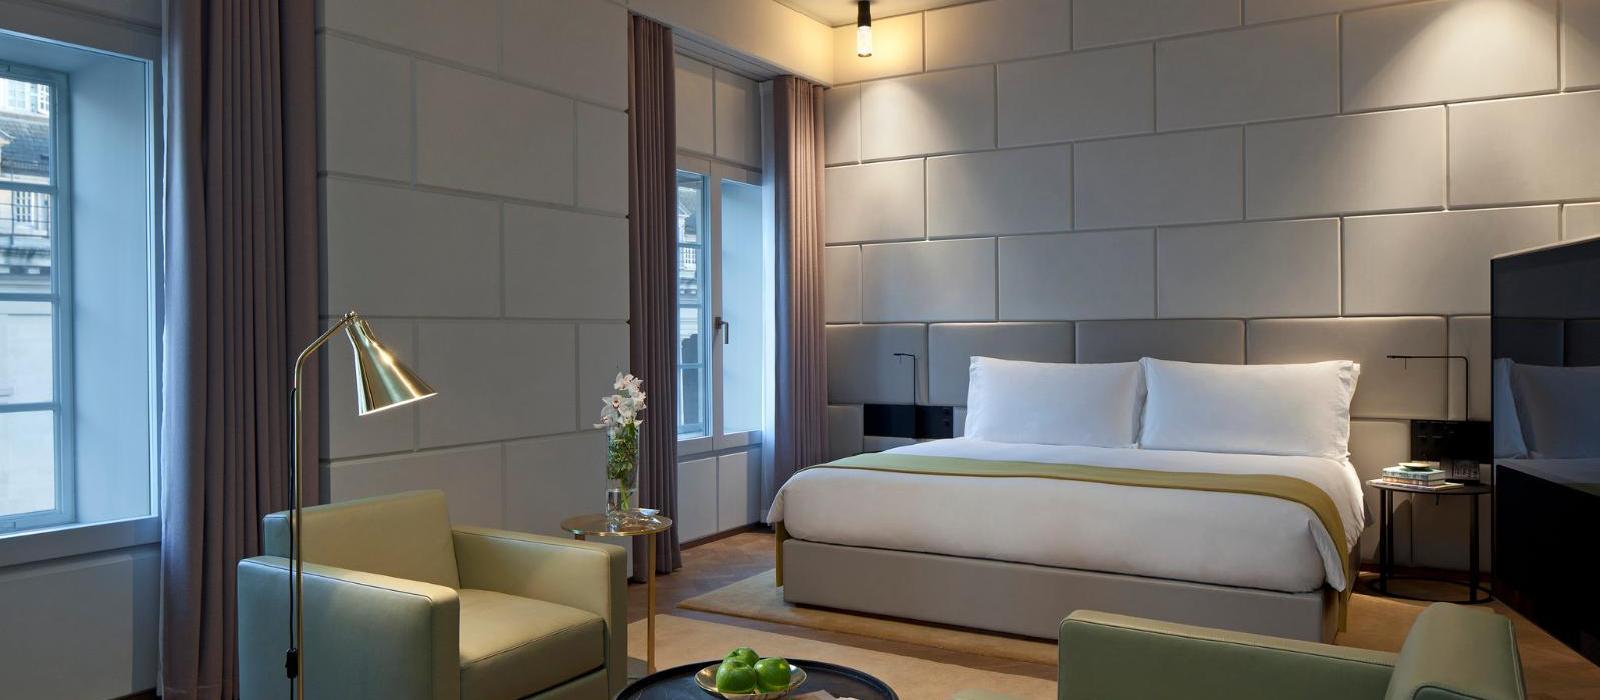 皇家凯馥酒店(Hotel Cafe Royal) 标准套房图片  www.lhw.cn